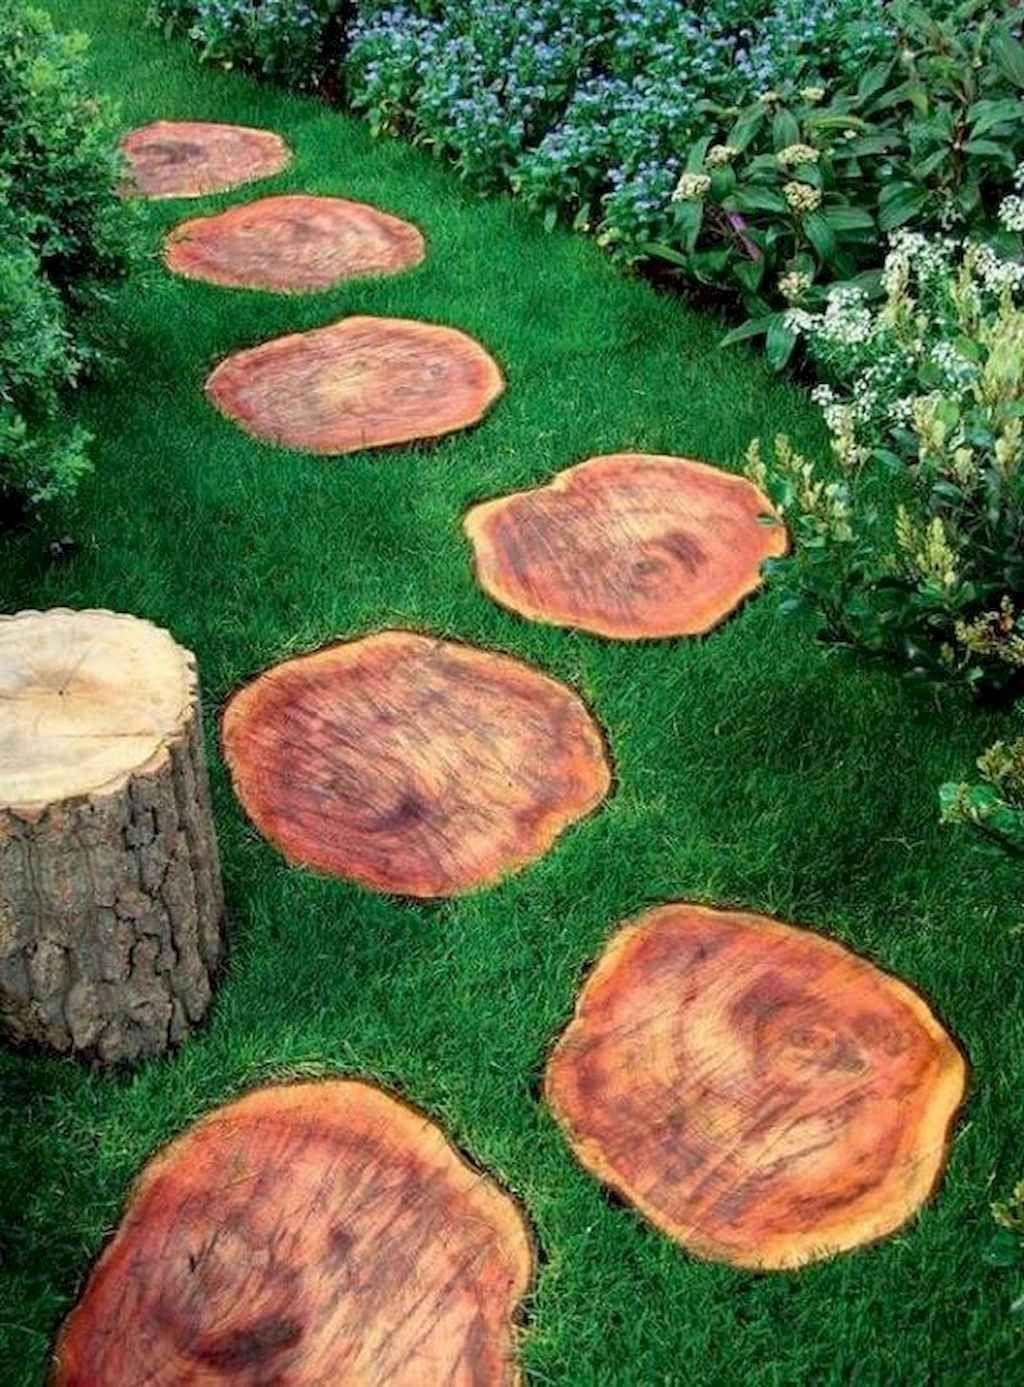 90 Awesome Garden Path And Walkways Design For Your Amazing Garden Garden Stepping Stones Garden Paths Backyard Landscaping